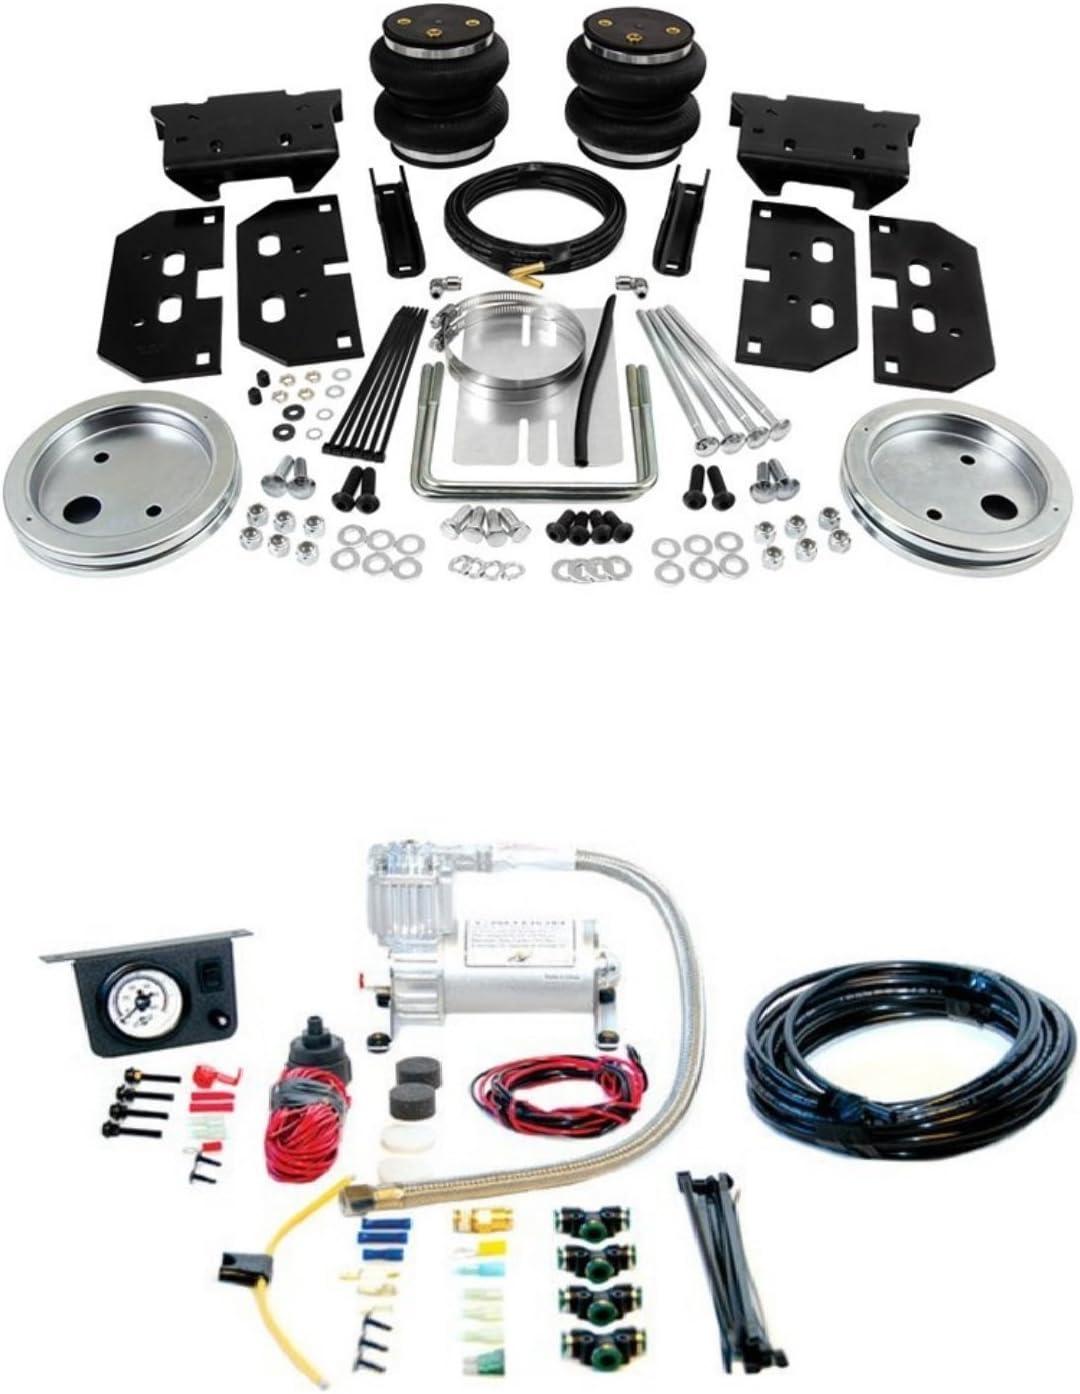 Ram 2500//3500 Air Lift 57297 LoadLifter 5000 for 03 Dodge Ram 2500//3500 /& 11